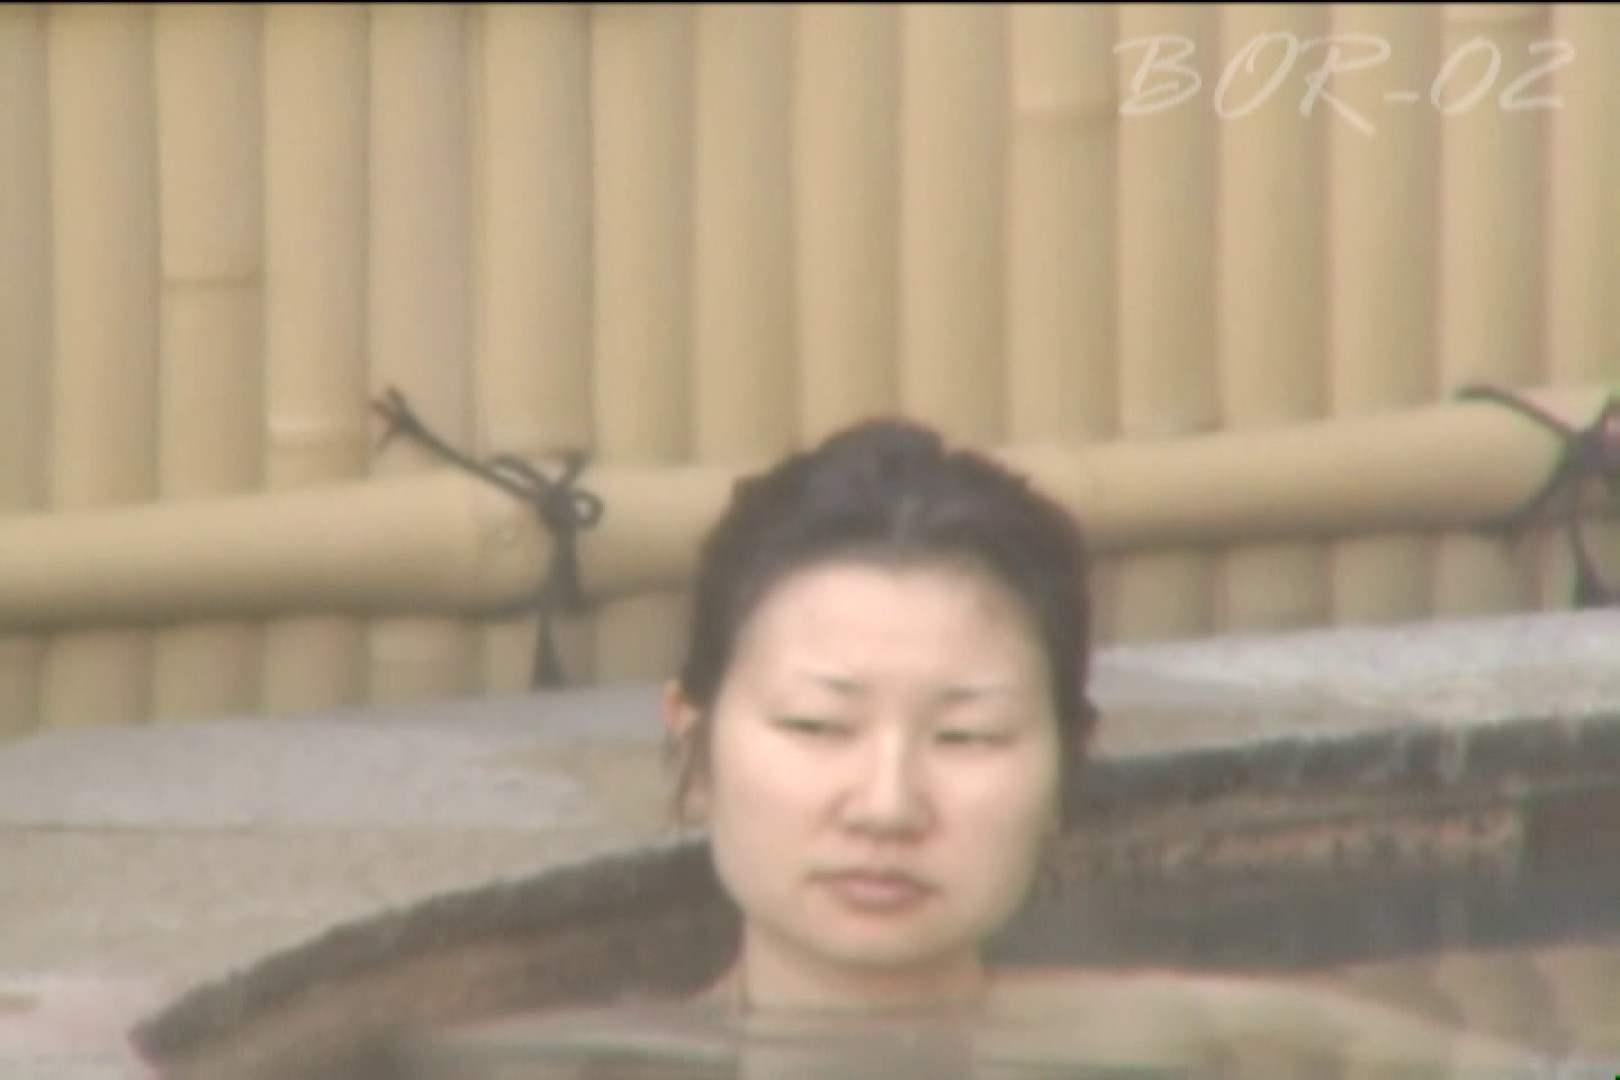 Aquaな露天風呂Vol.476 盗撮 濡れ場動画紹介 80画像 20